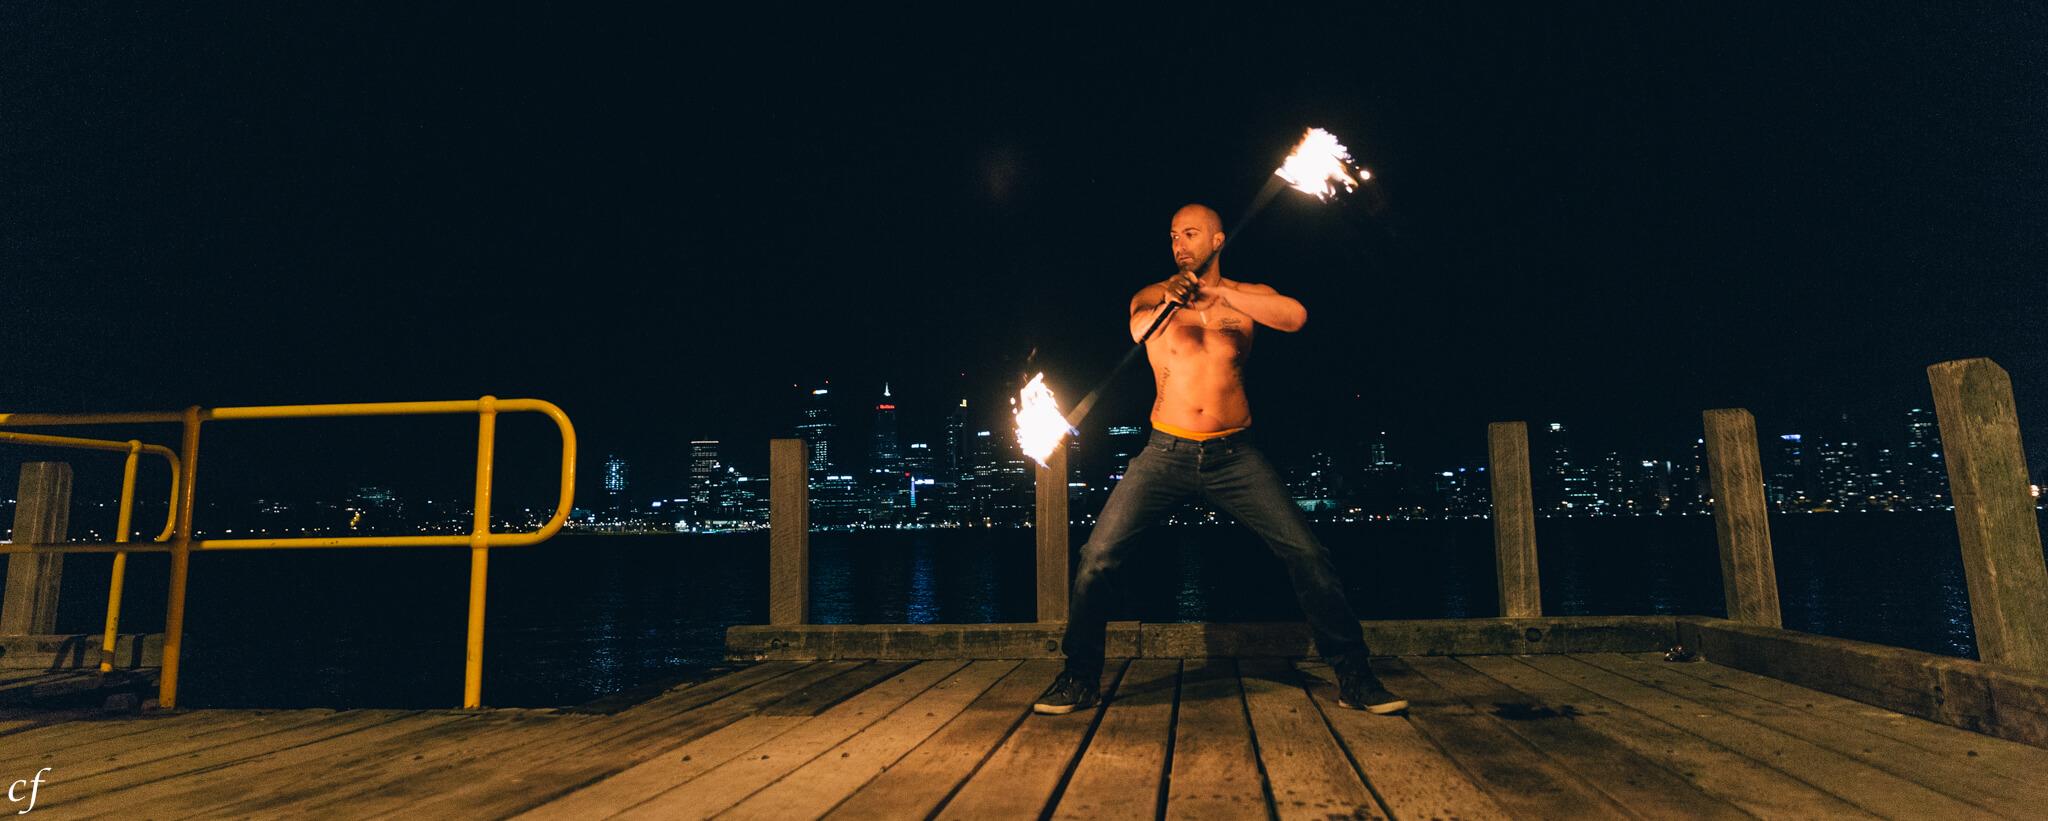 Joey on Fire | Fire Performer